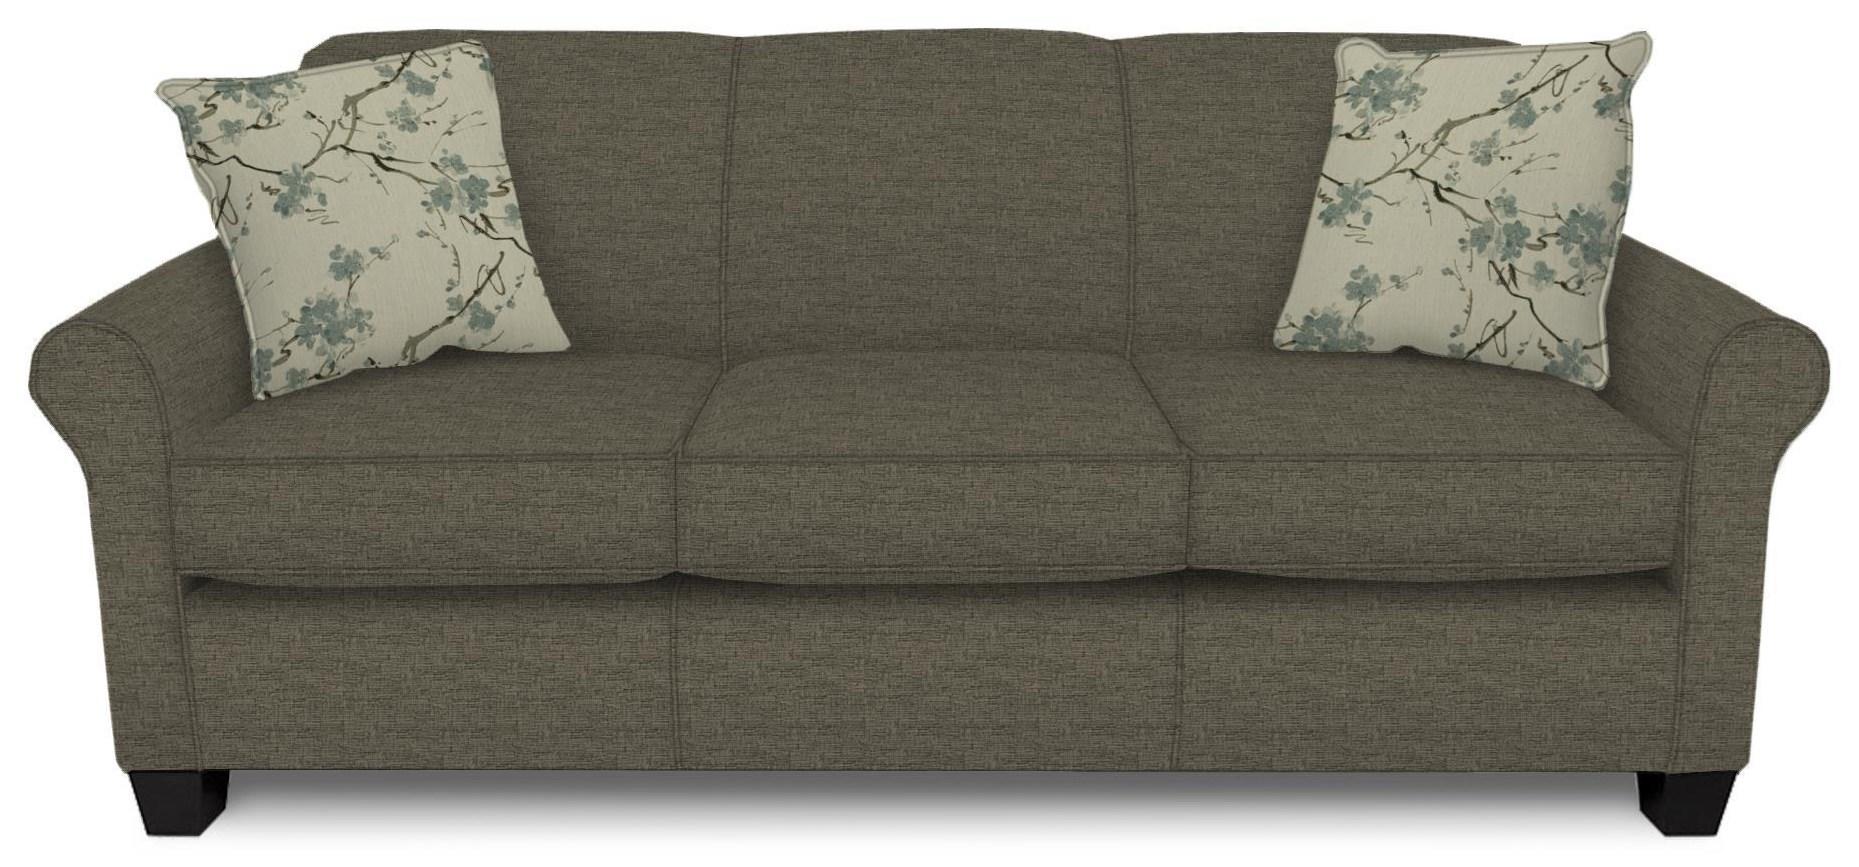 Delaney Sofa by England at Crowley Furniture & Mattress